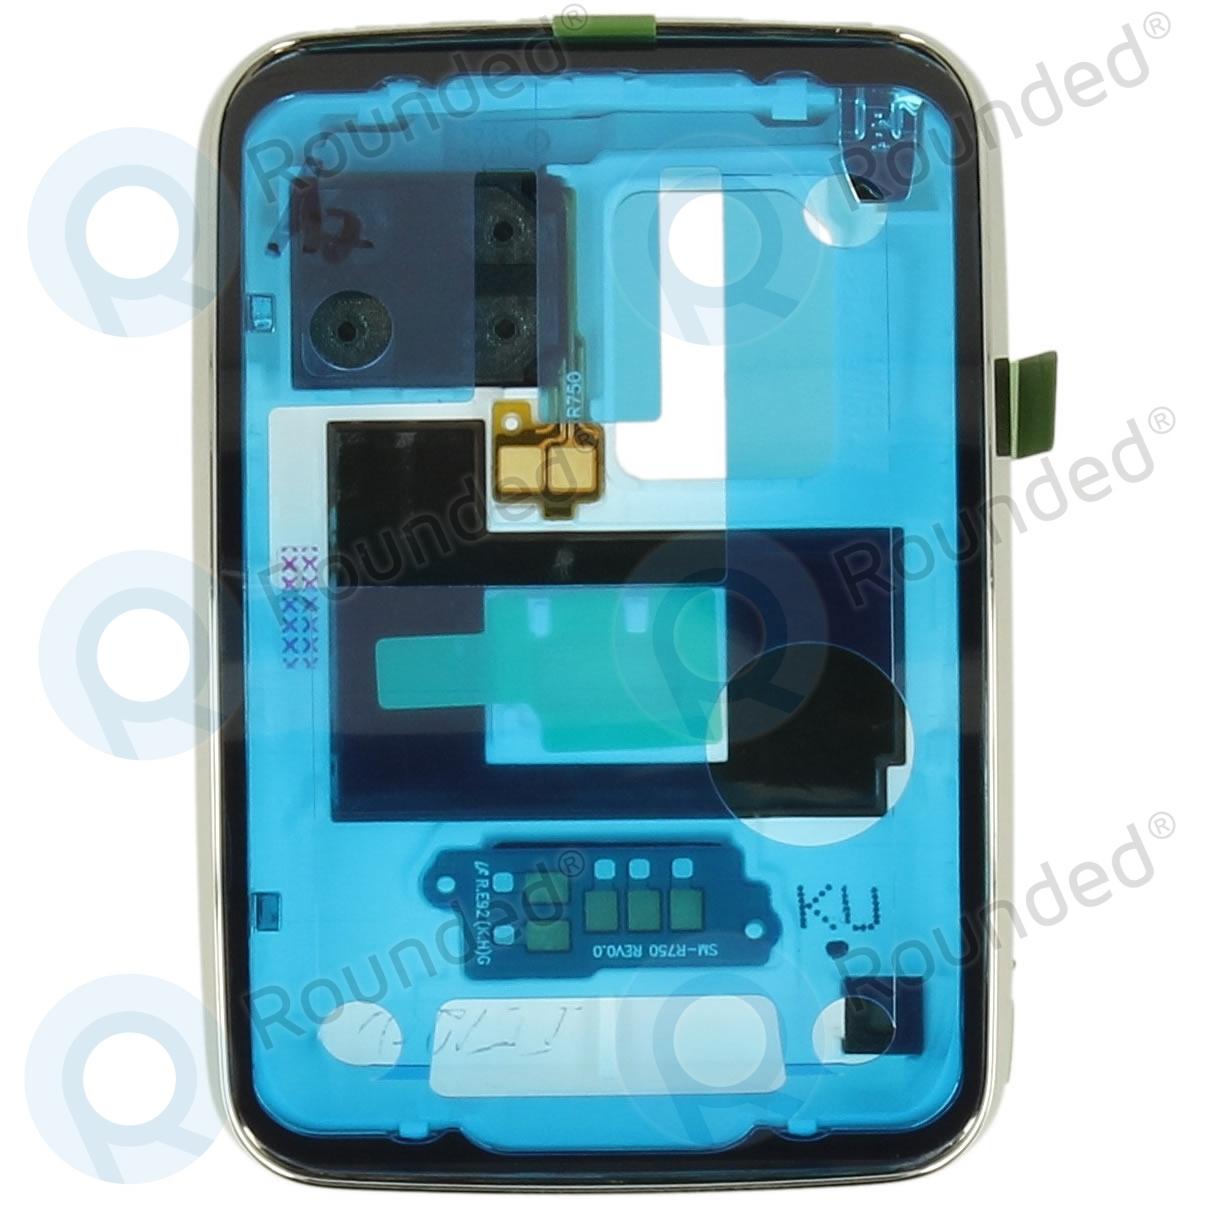 Samsung Galaxy Gear S (SM-R750) Back cover white